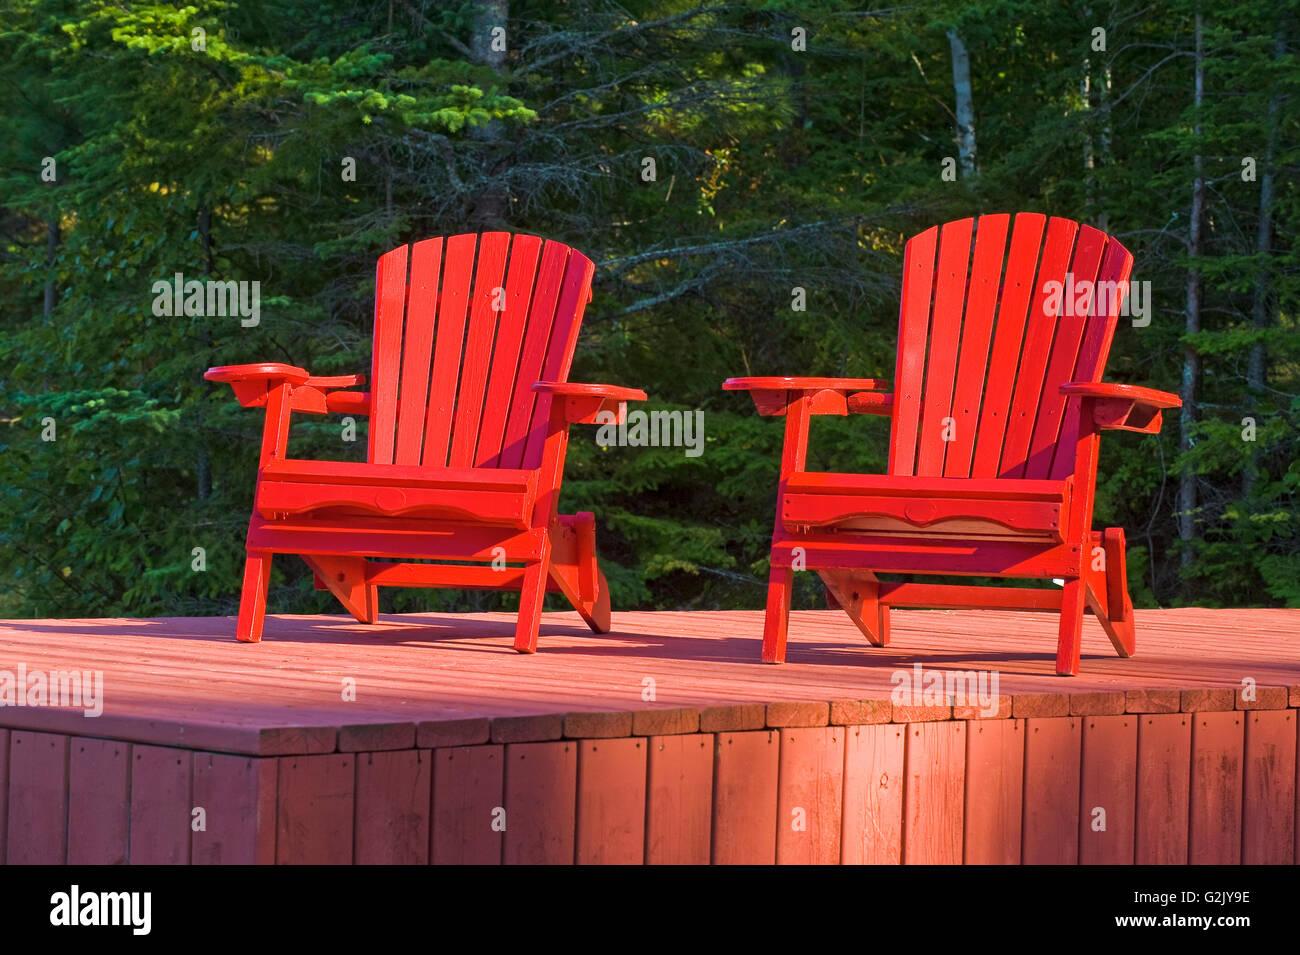 Muskoka chairs on dock, Lake of the Woods, Northwestern Ontario, Canada - Stock Image